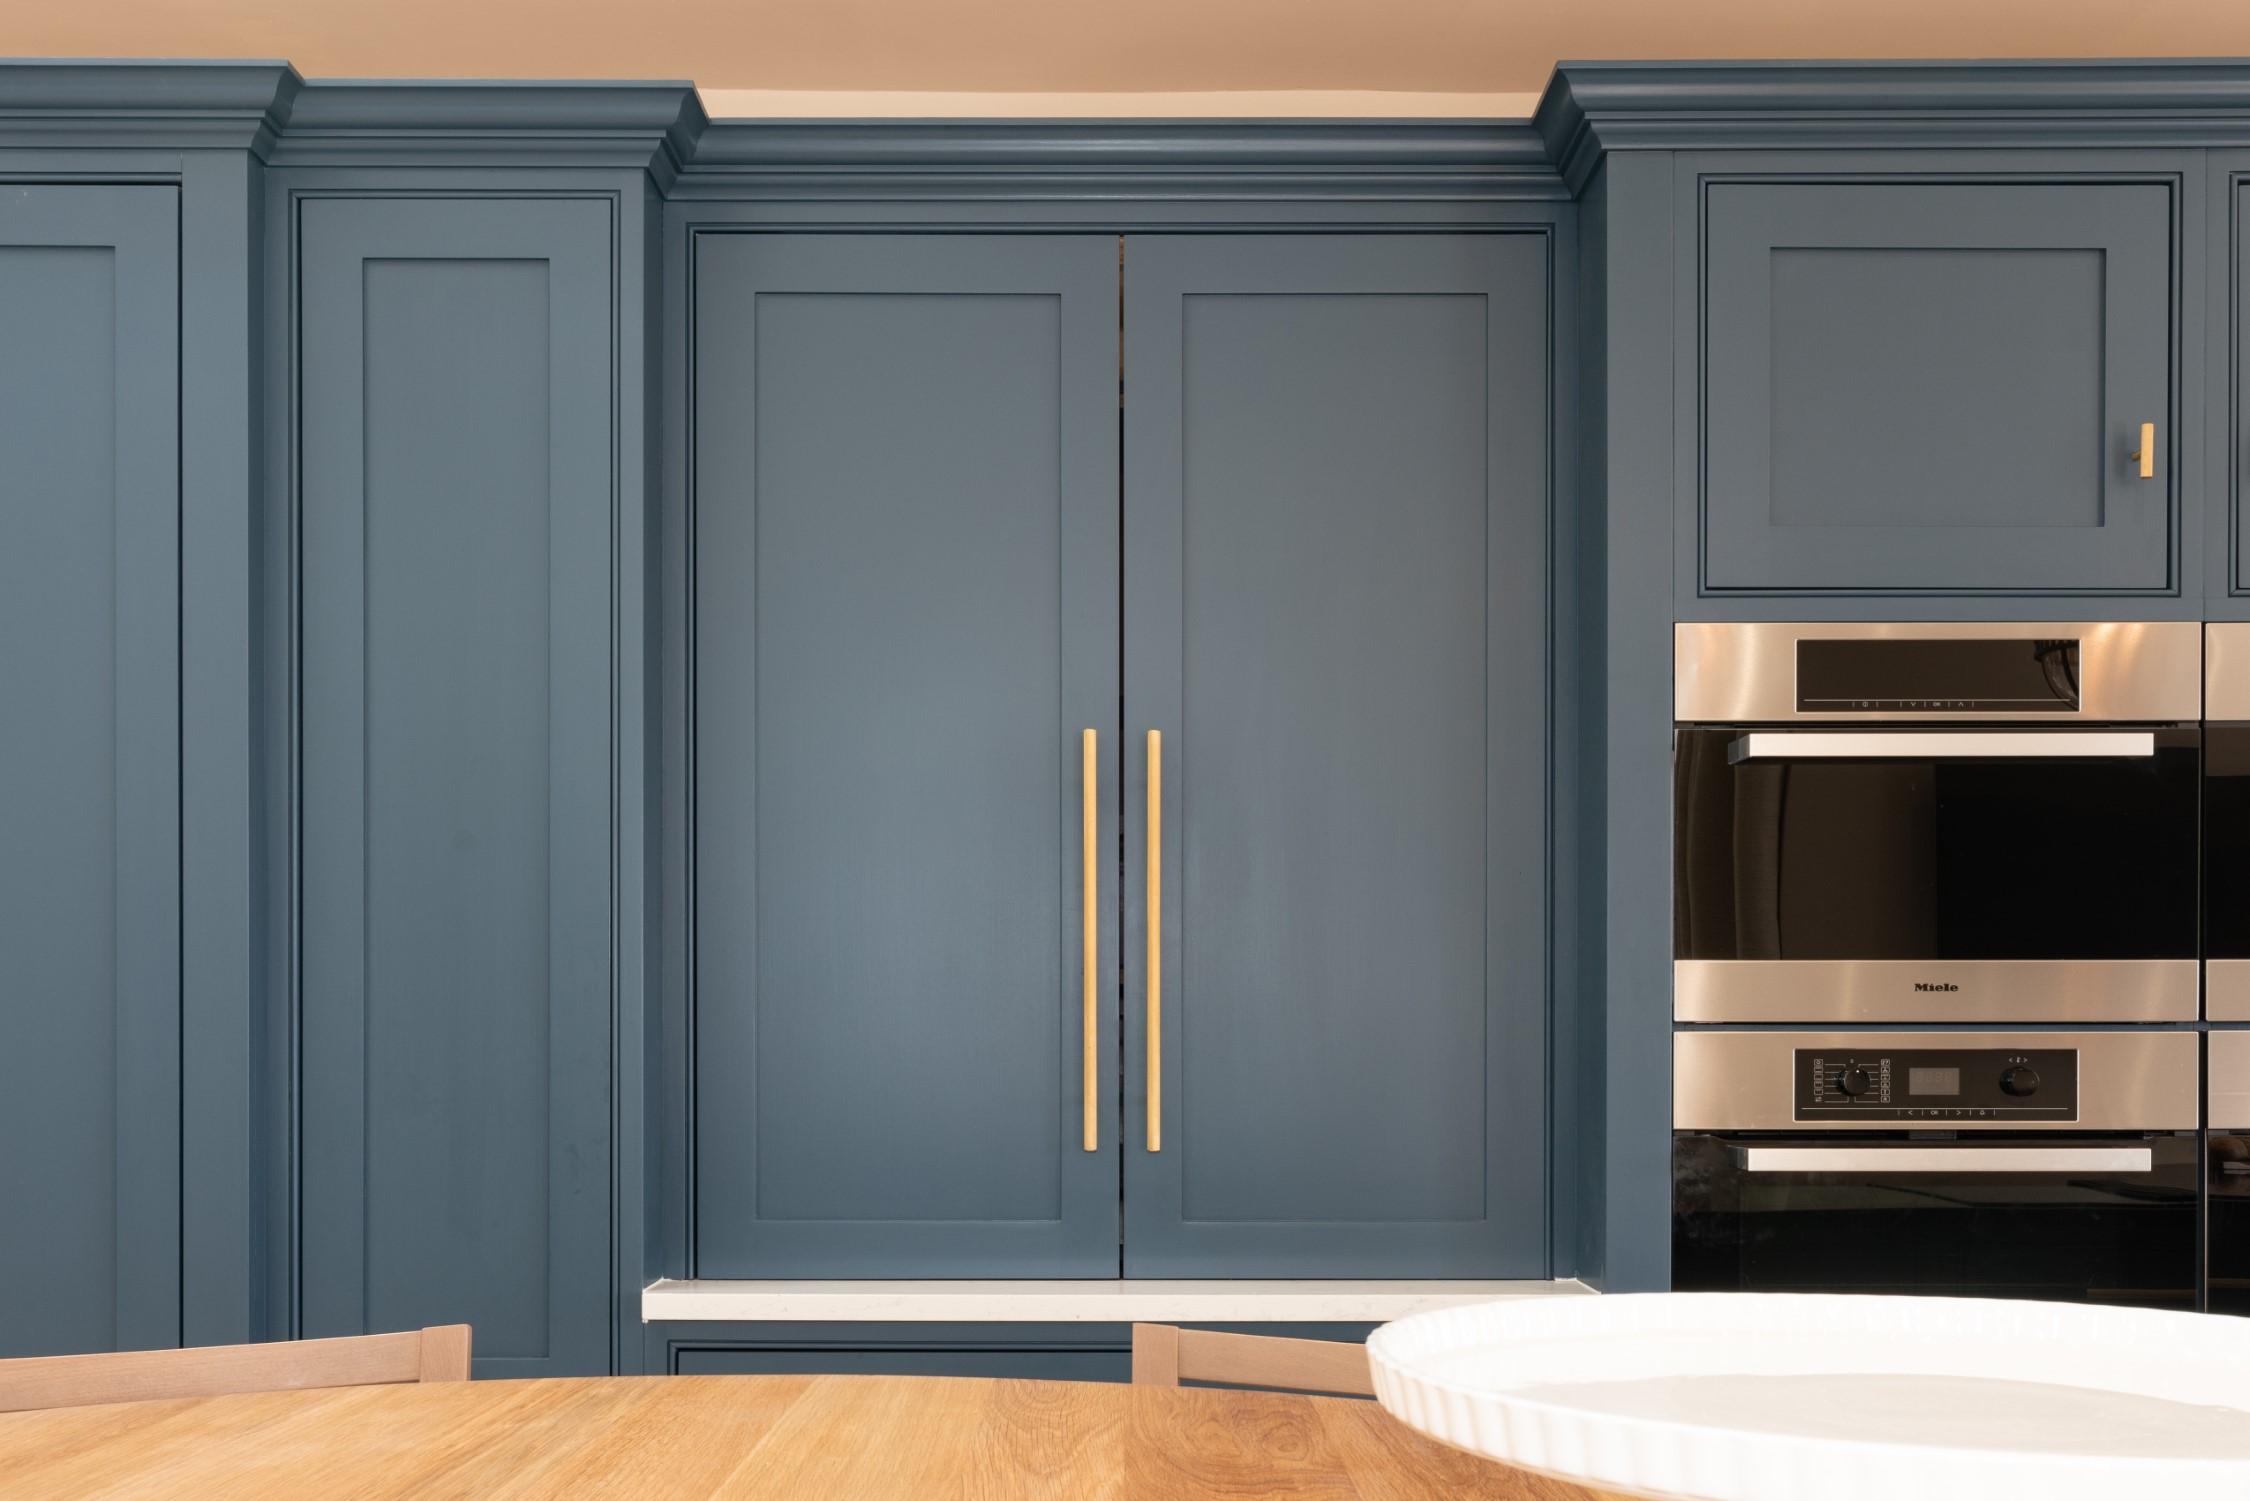 Design Details Explored - Cornice, Pelmet & Plinth ...